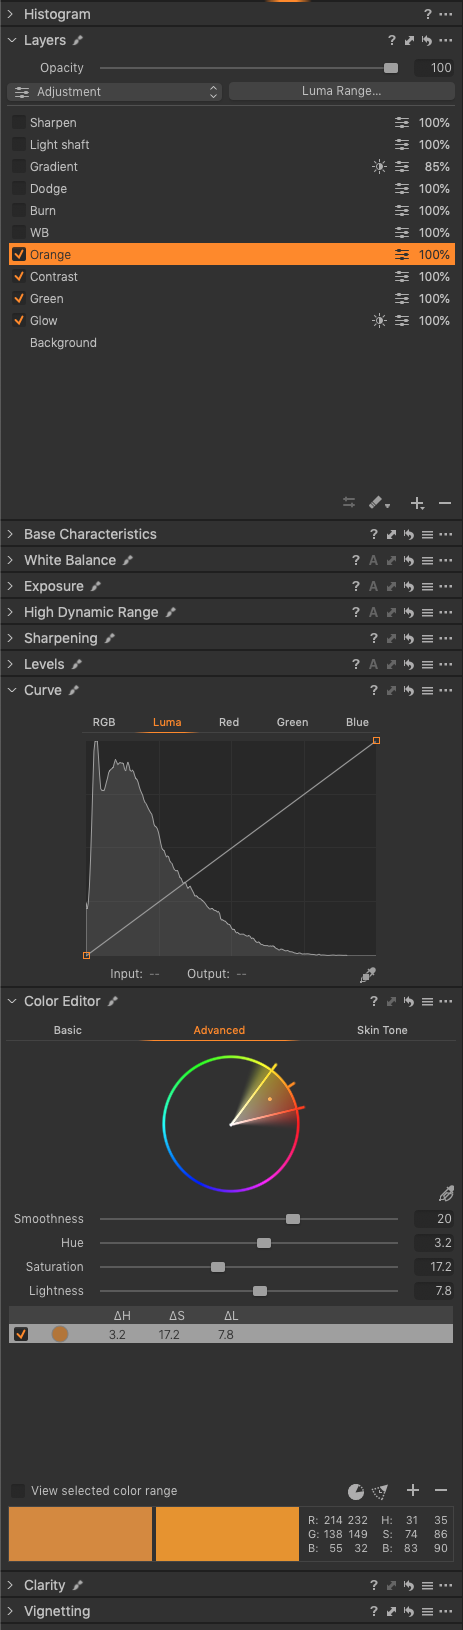 05 Colour Editor Orange